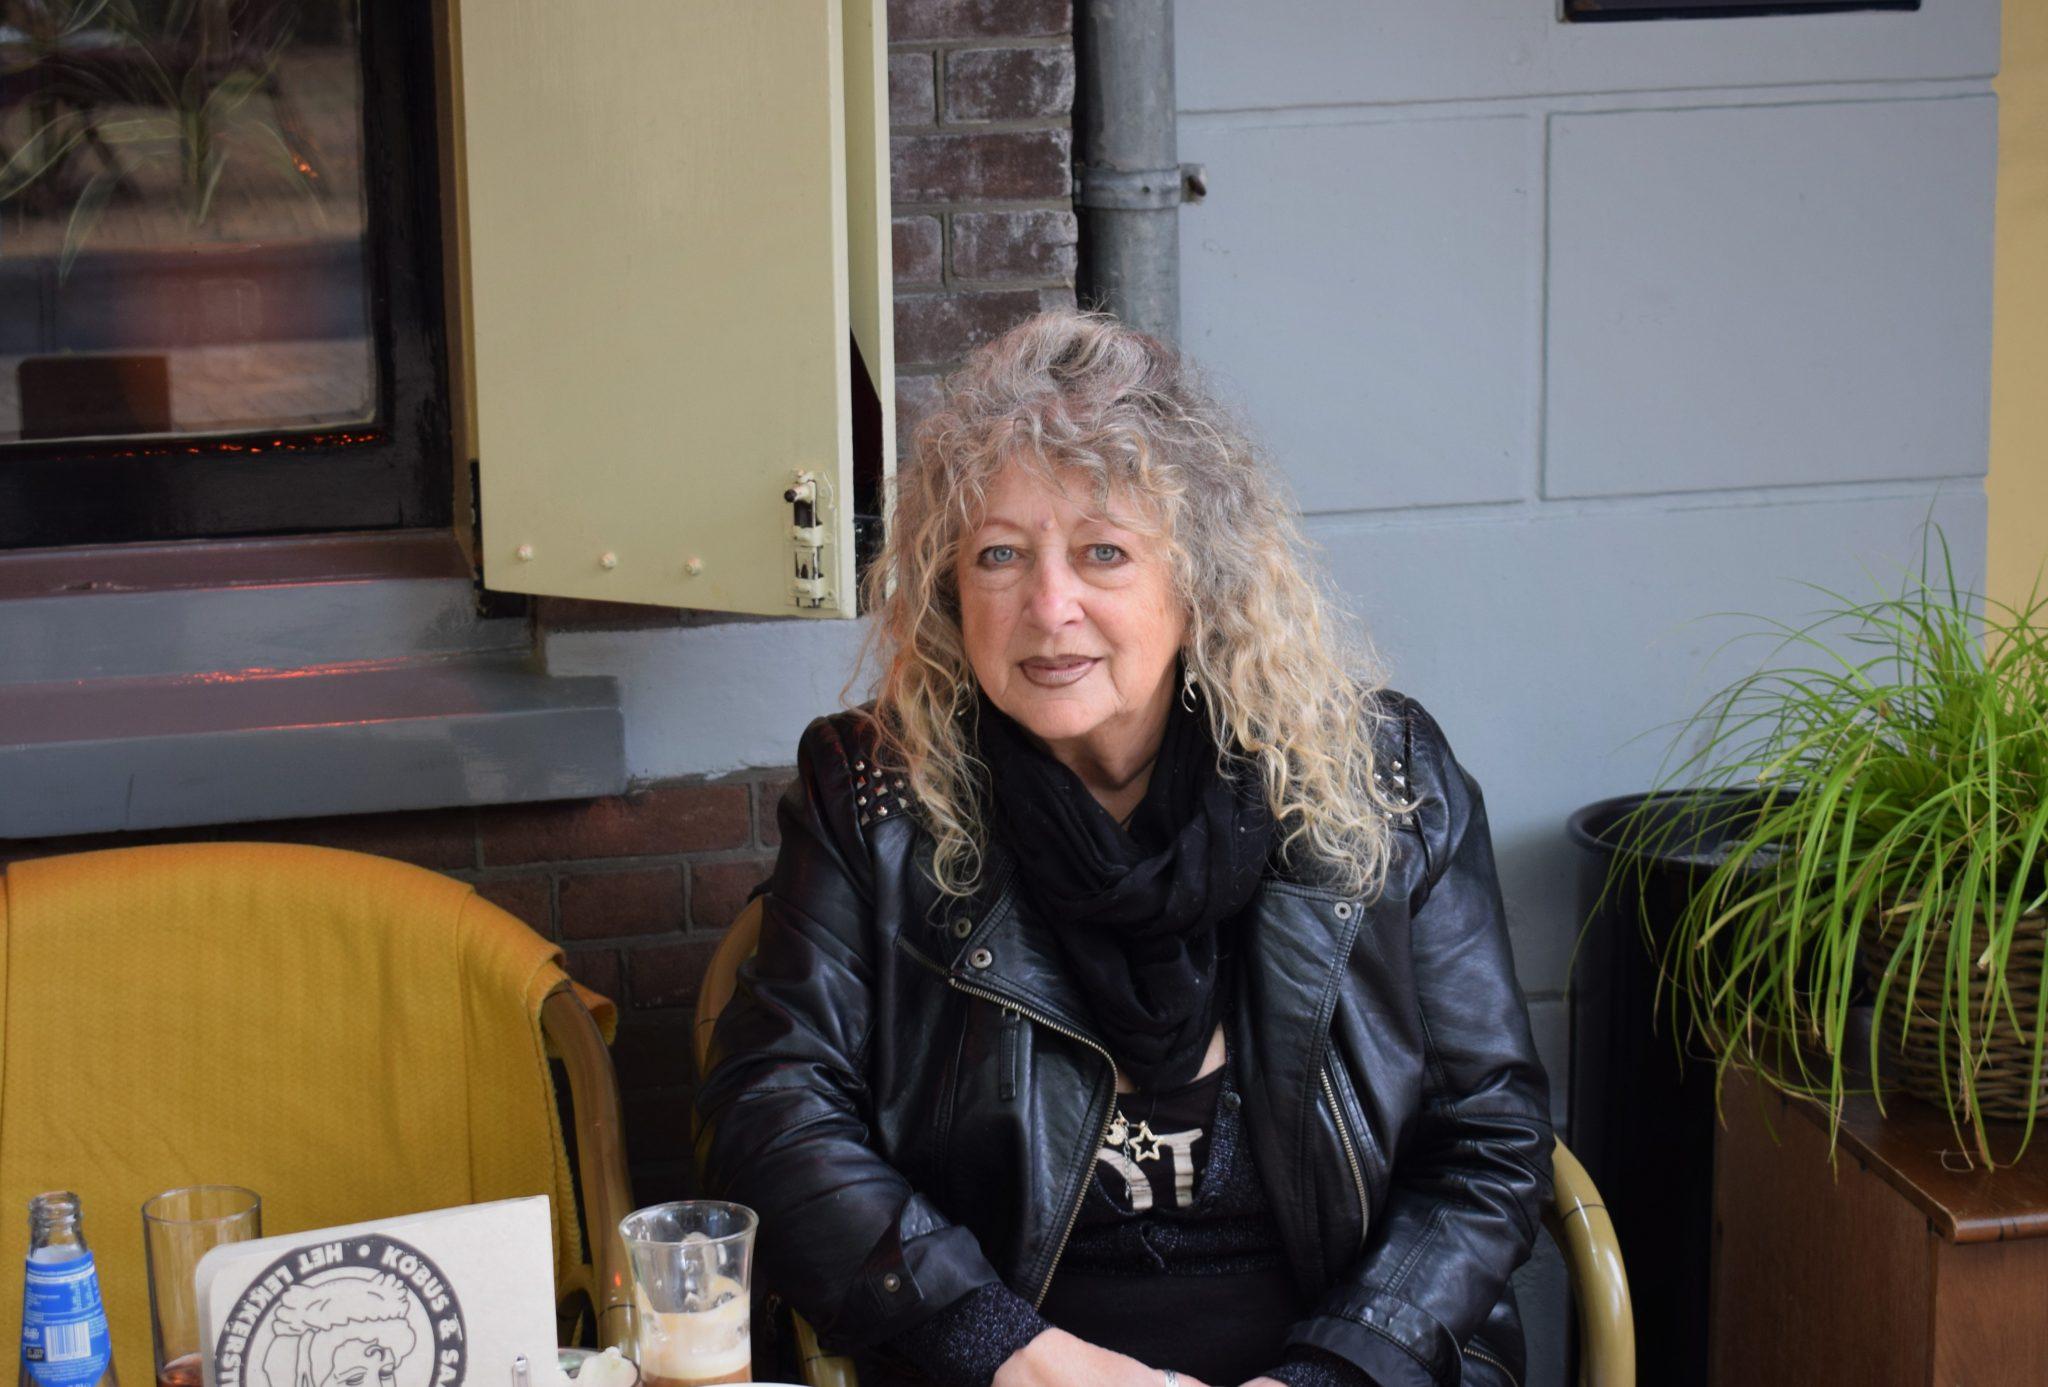 Delftenaar Anna Krul